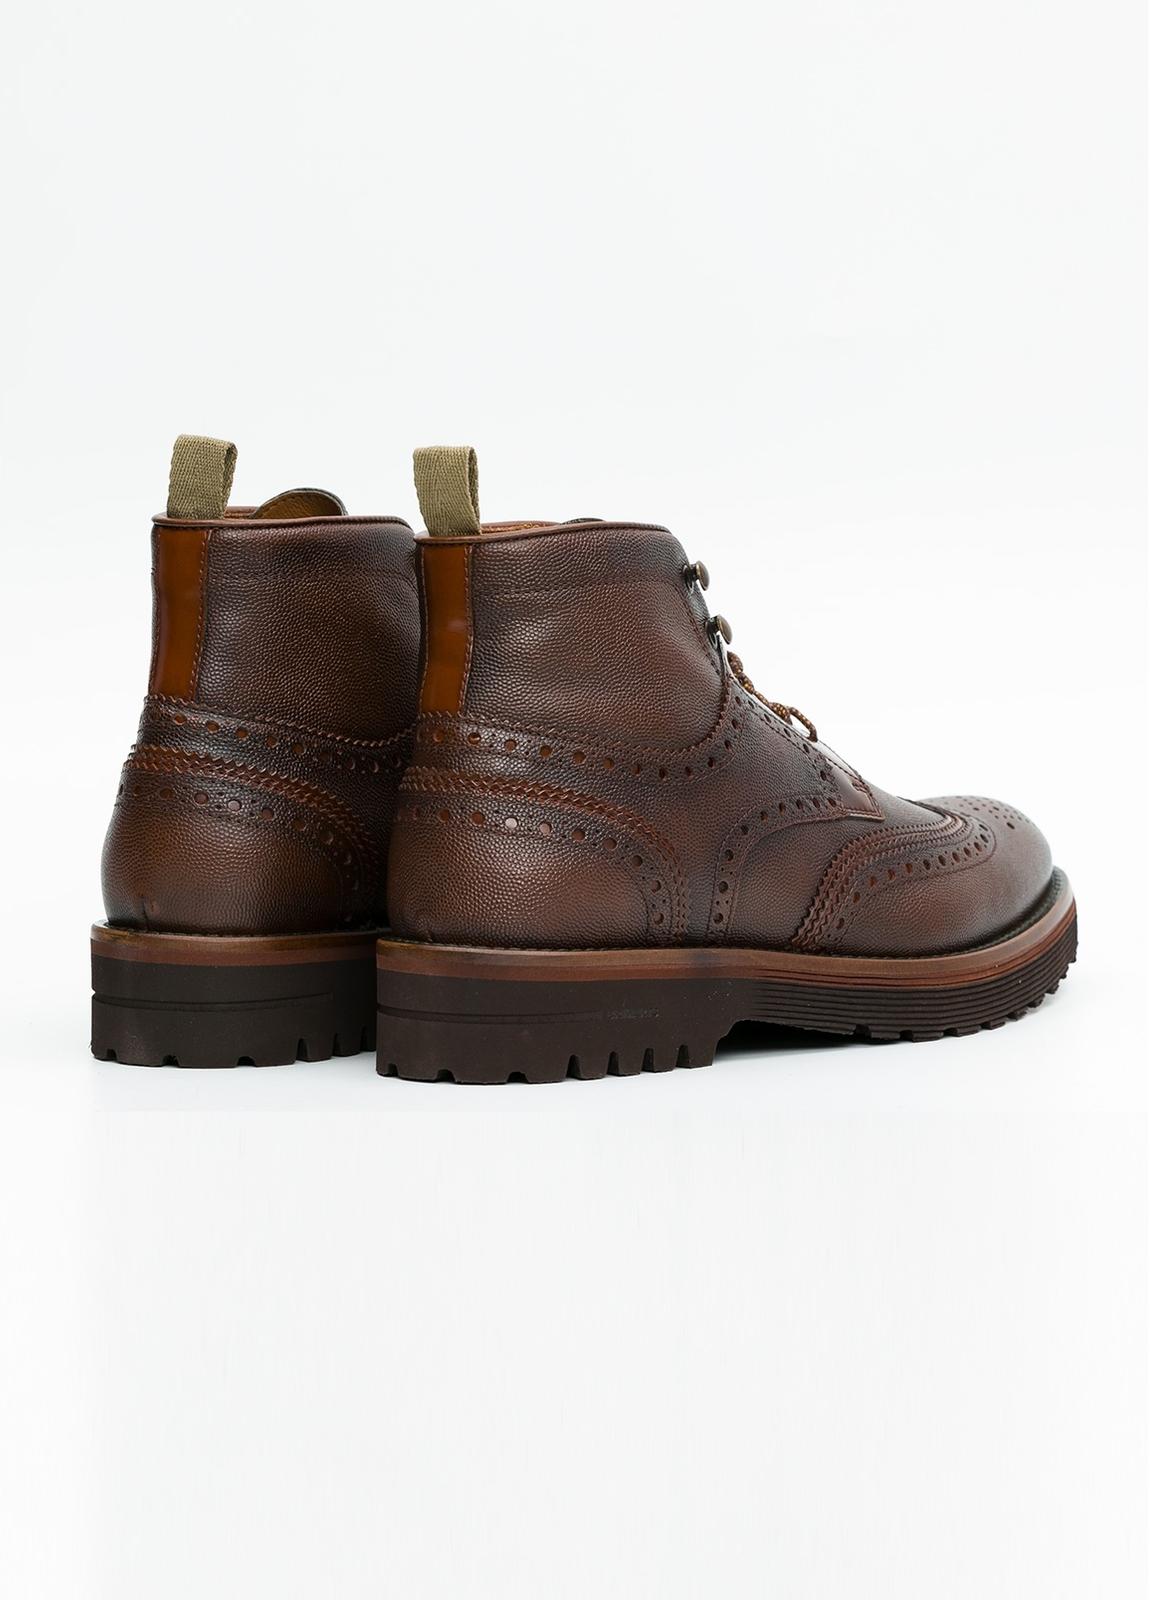 Botín Formal Wear color marrón. 100% Piel troquelada. - Ítem1